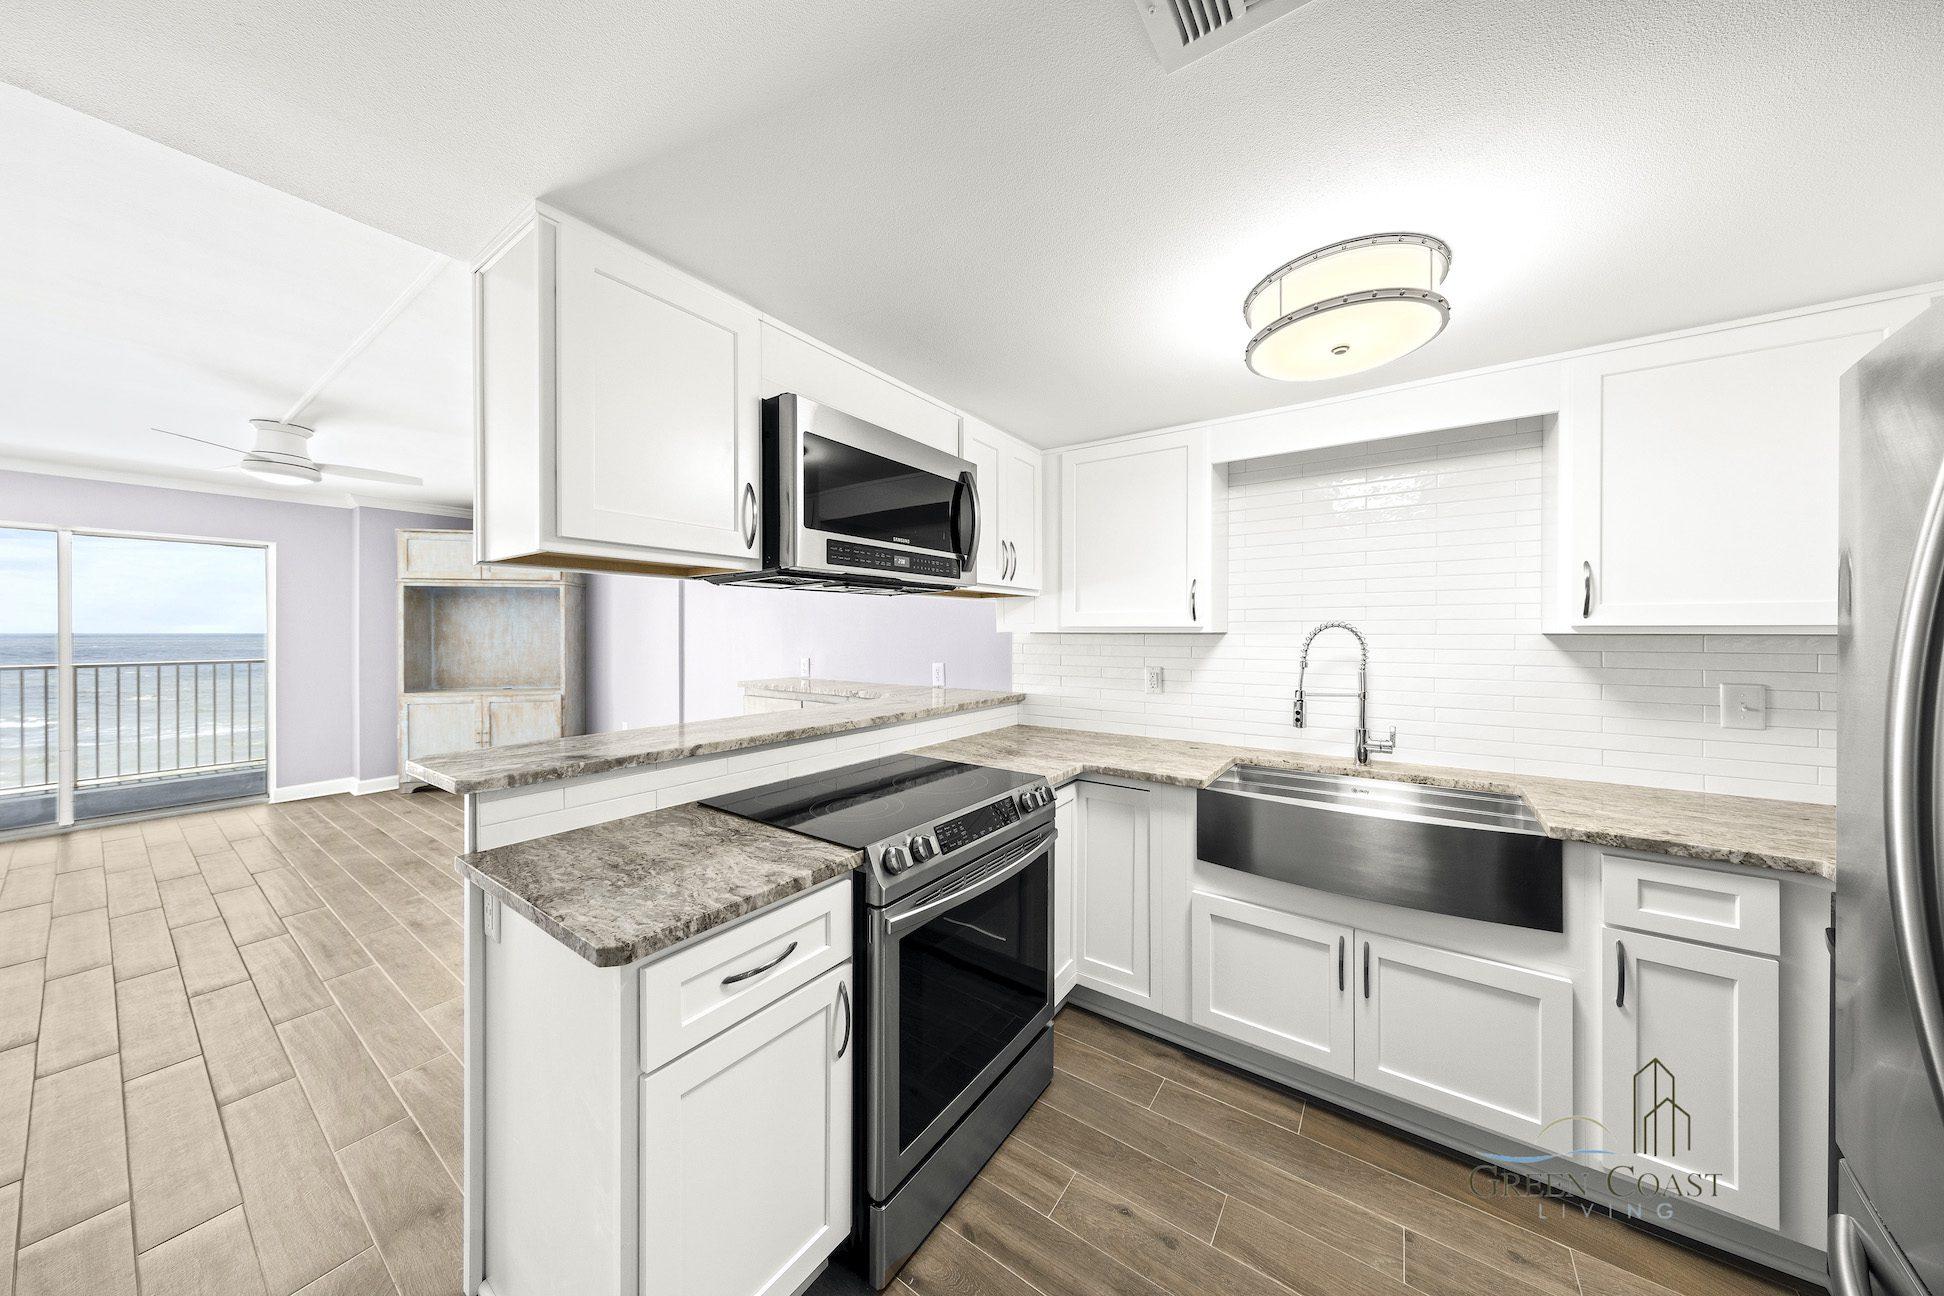 Green Coast Living - kitchen renovation.